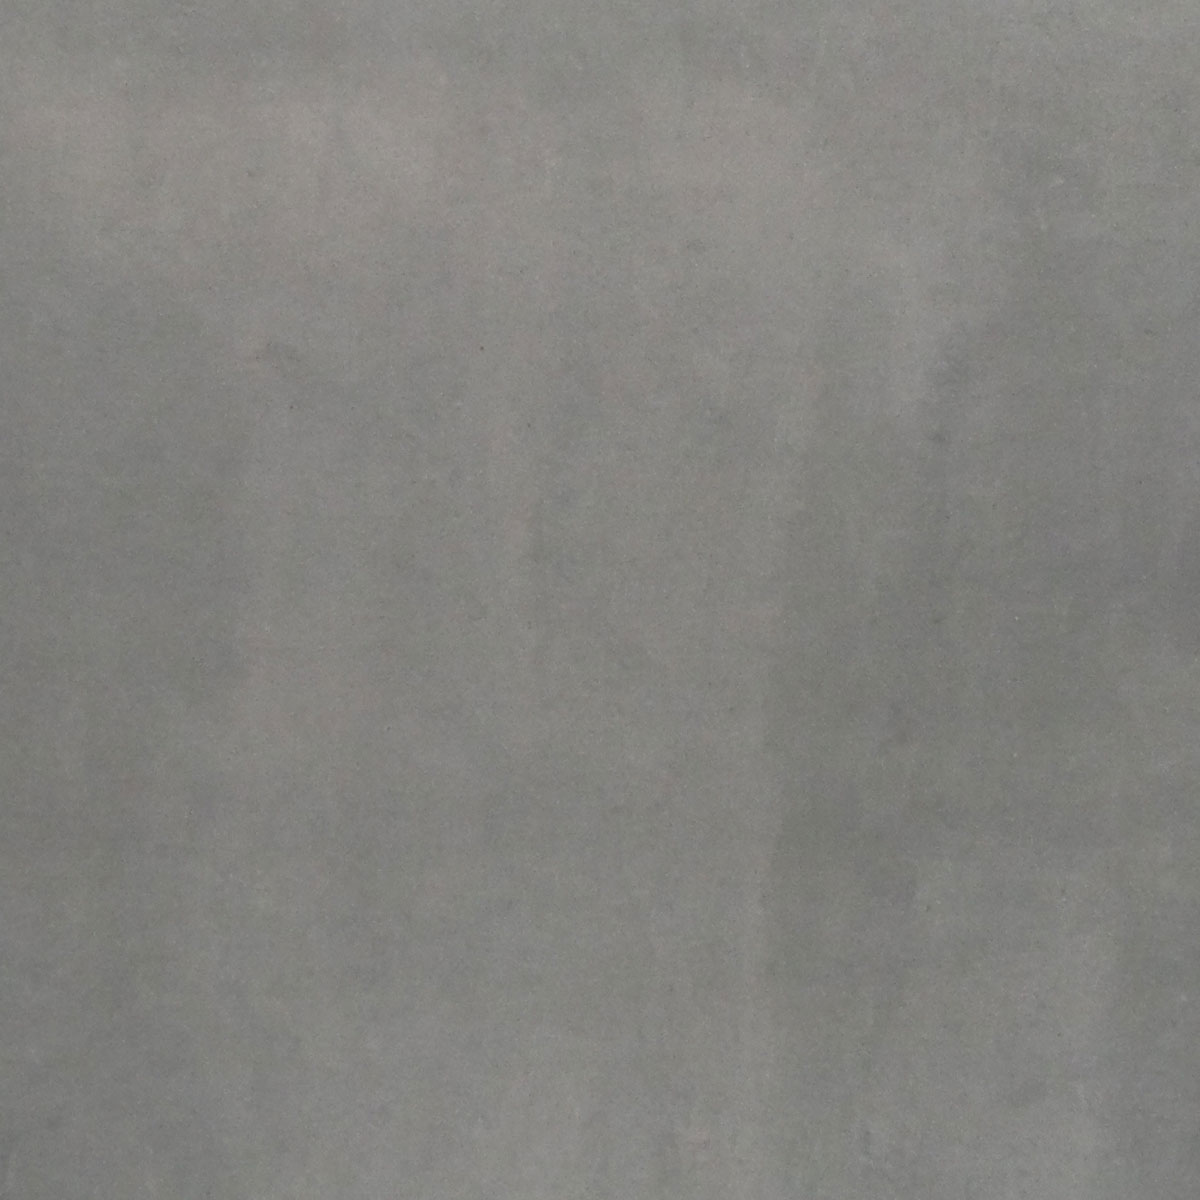 T-Trading Coutura Dark Grey CC04-60x60 Bodenfliese 60x60 matt